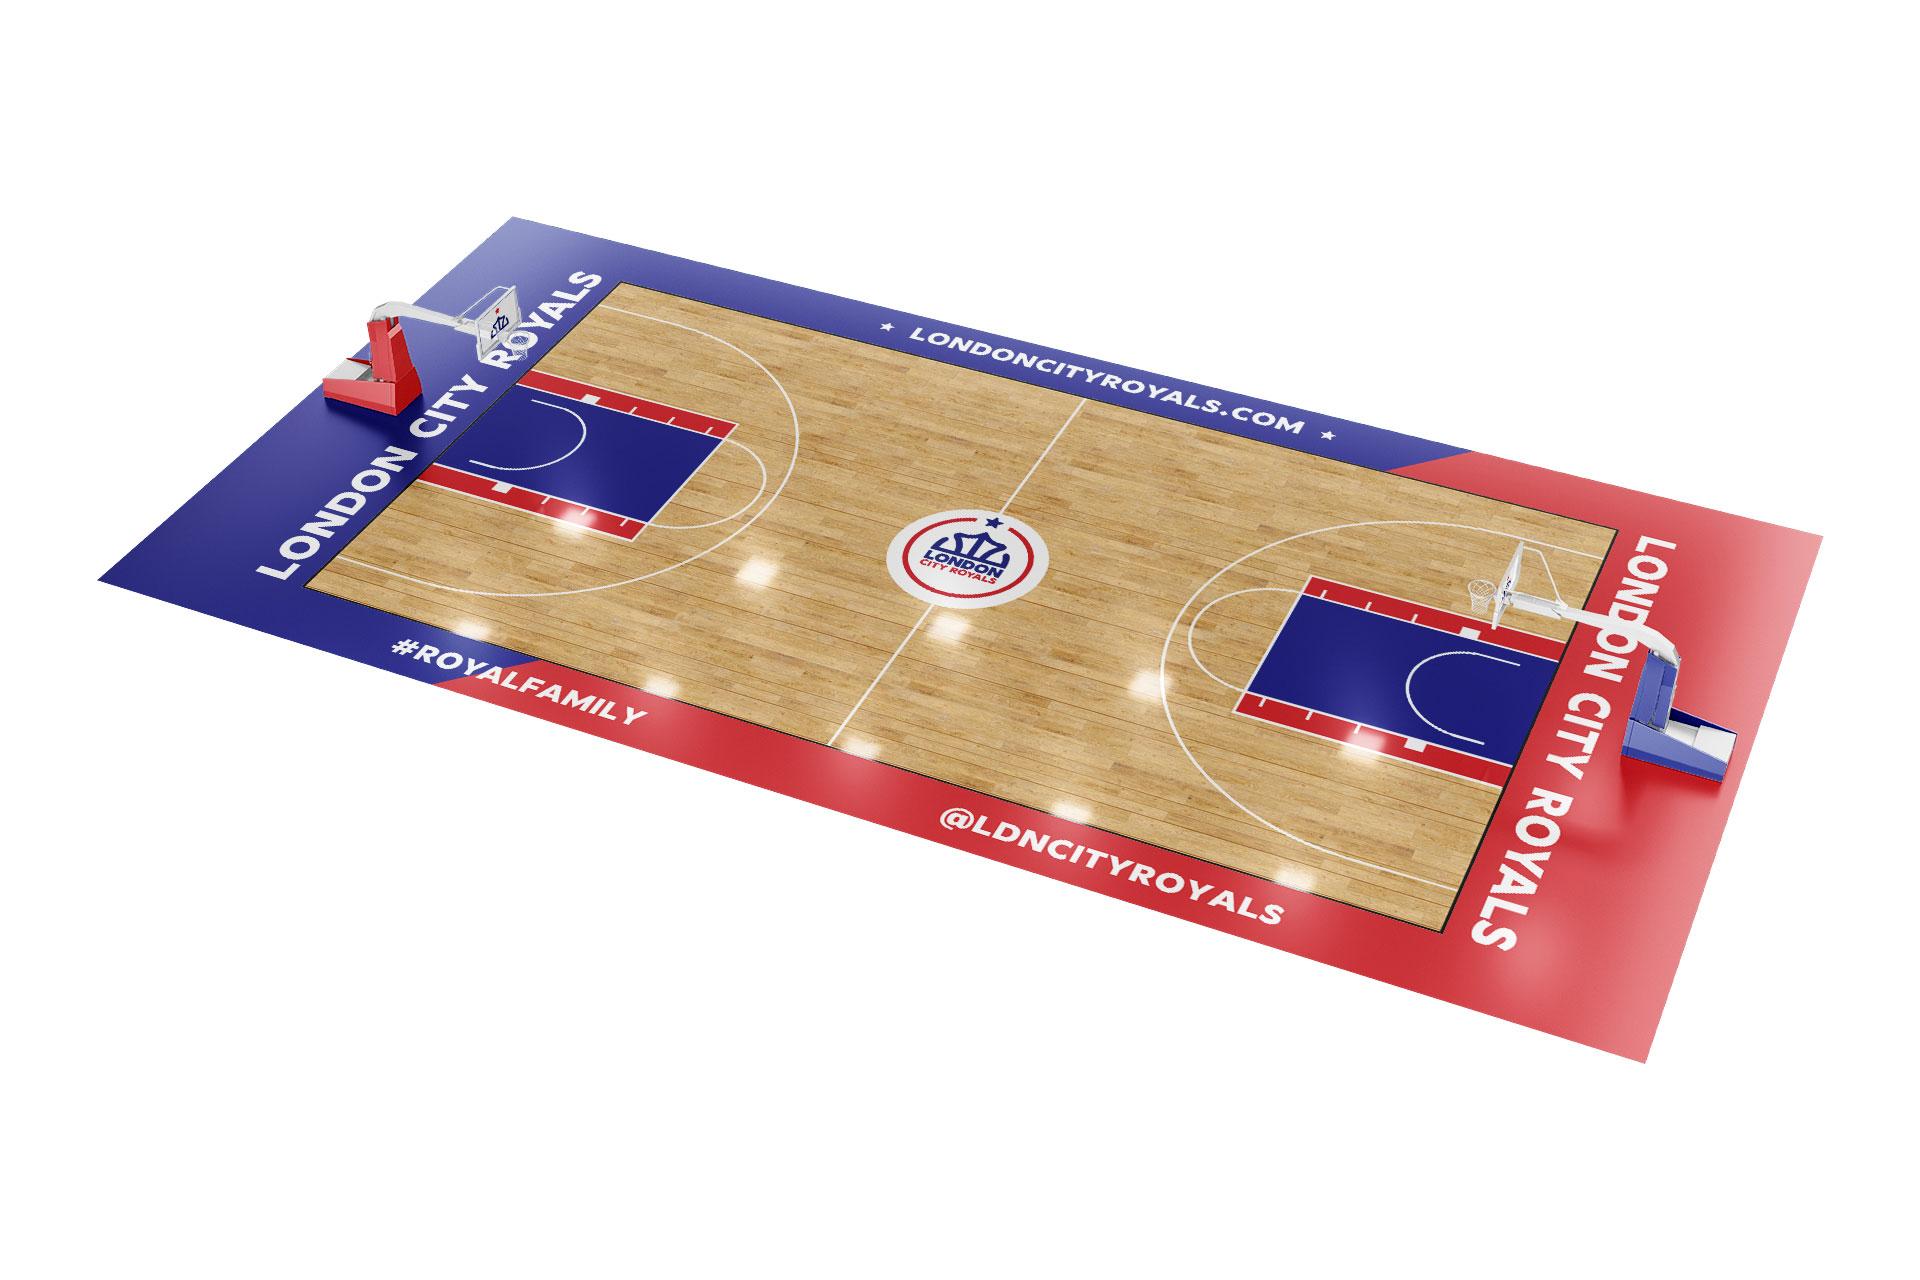 London-city-royals-branding-logo-basketball-court-design-by-orfi-media